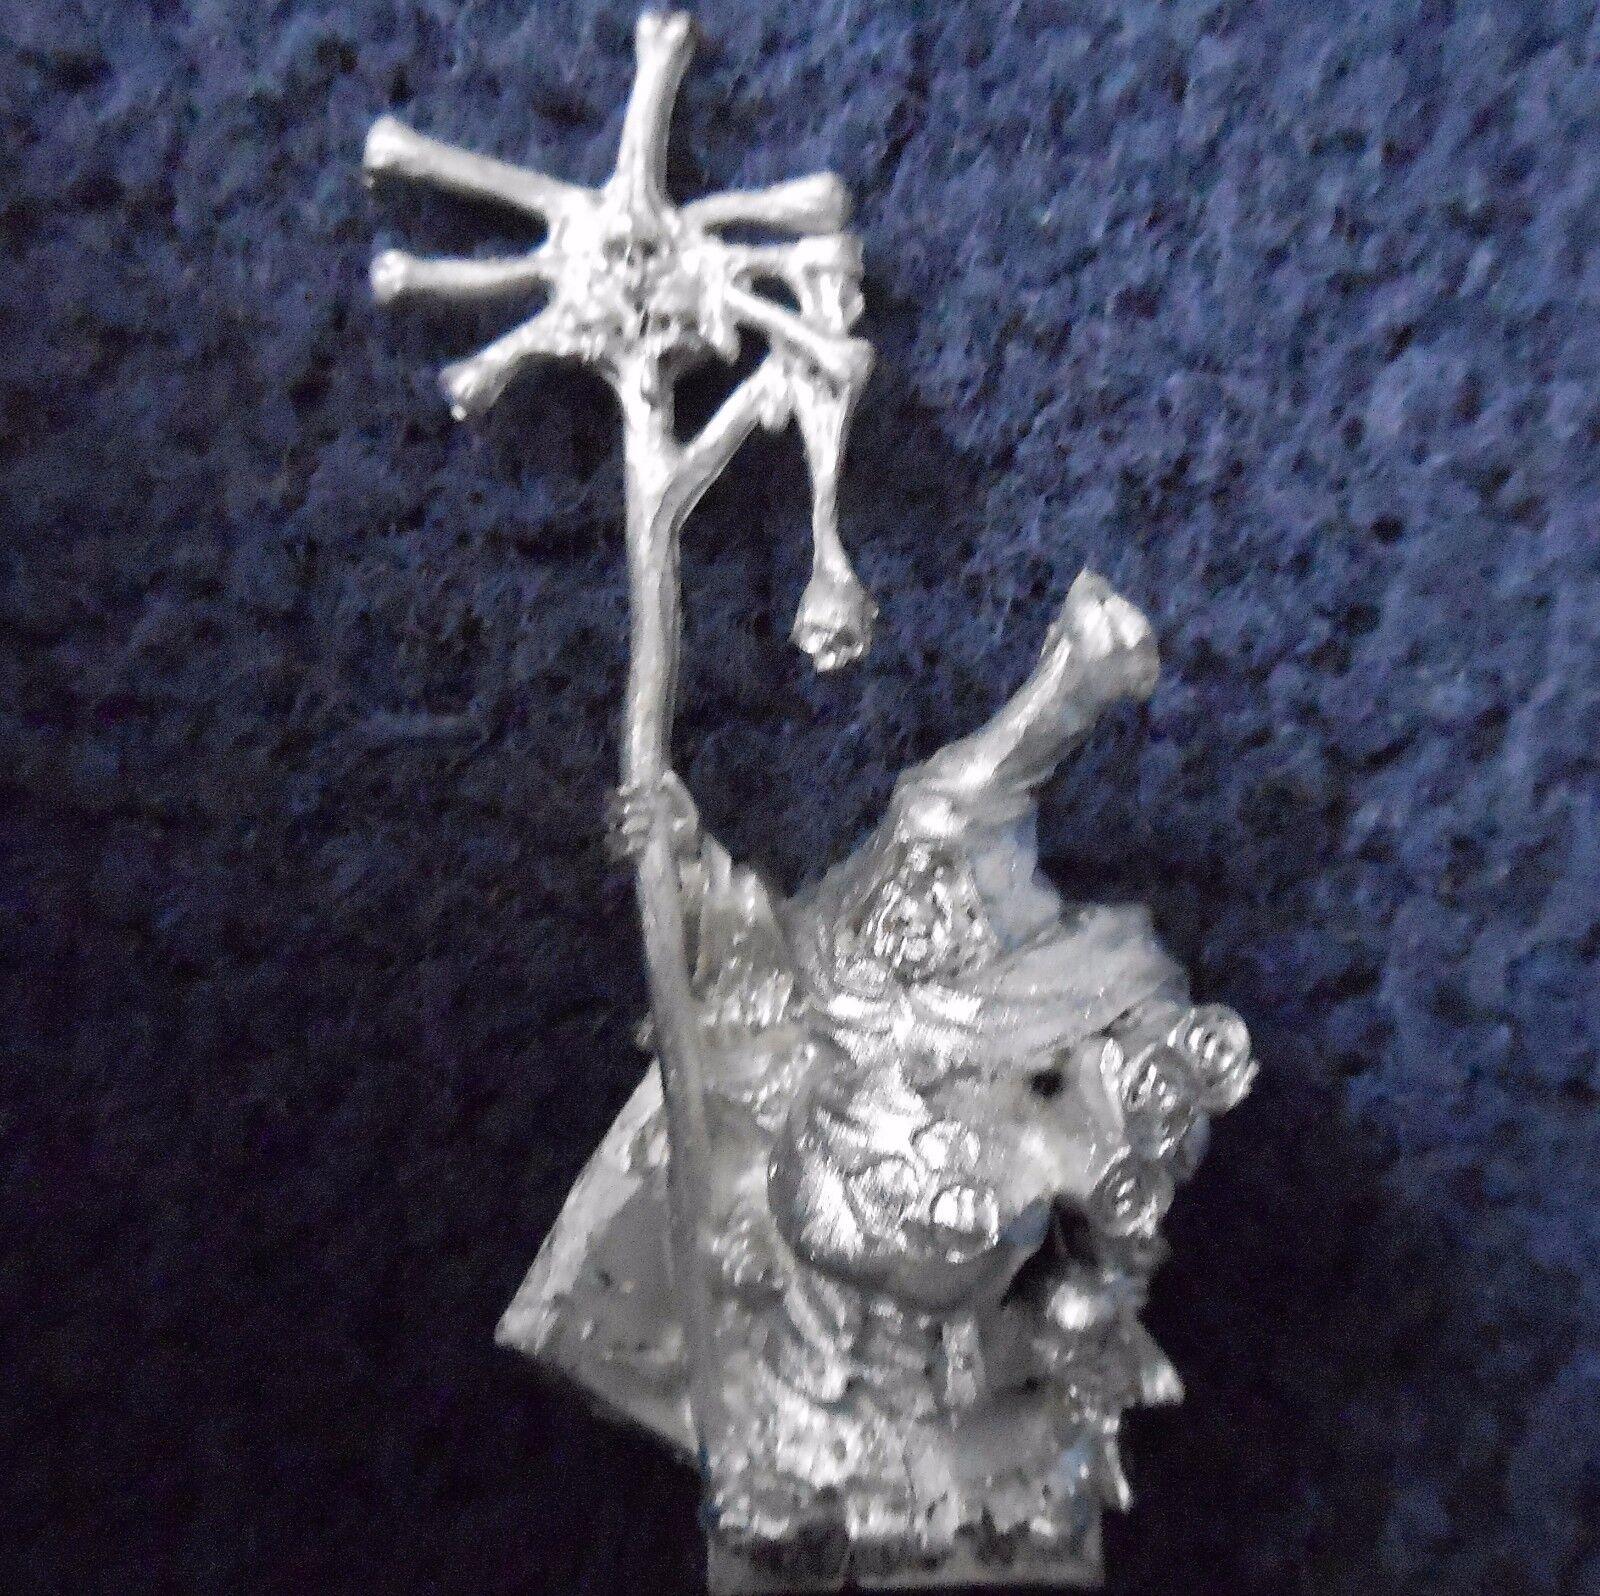 2007 Chaos Sorcerer of Nurgle redbringers Citadel Warhammer Army Mage Wizard D&D